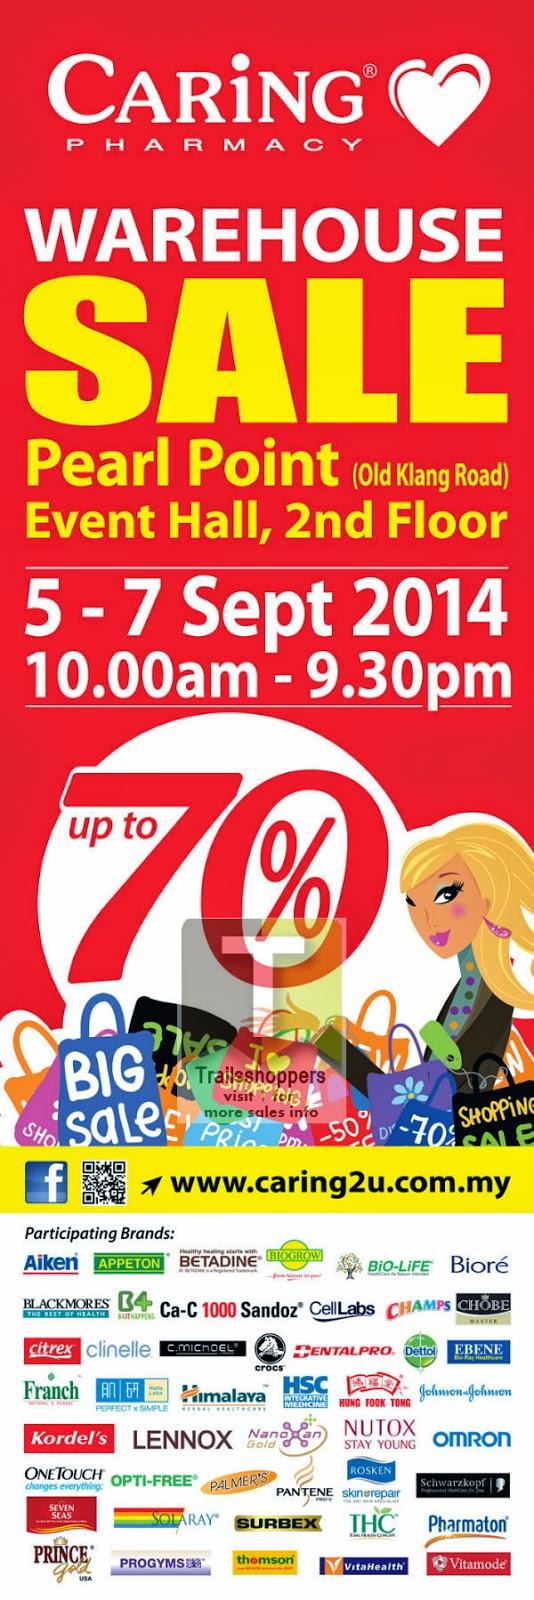 Caring Pharmacy malaysia Warehouse sale